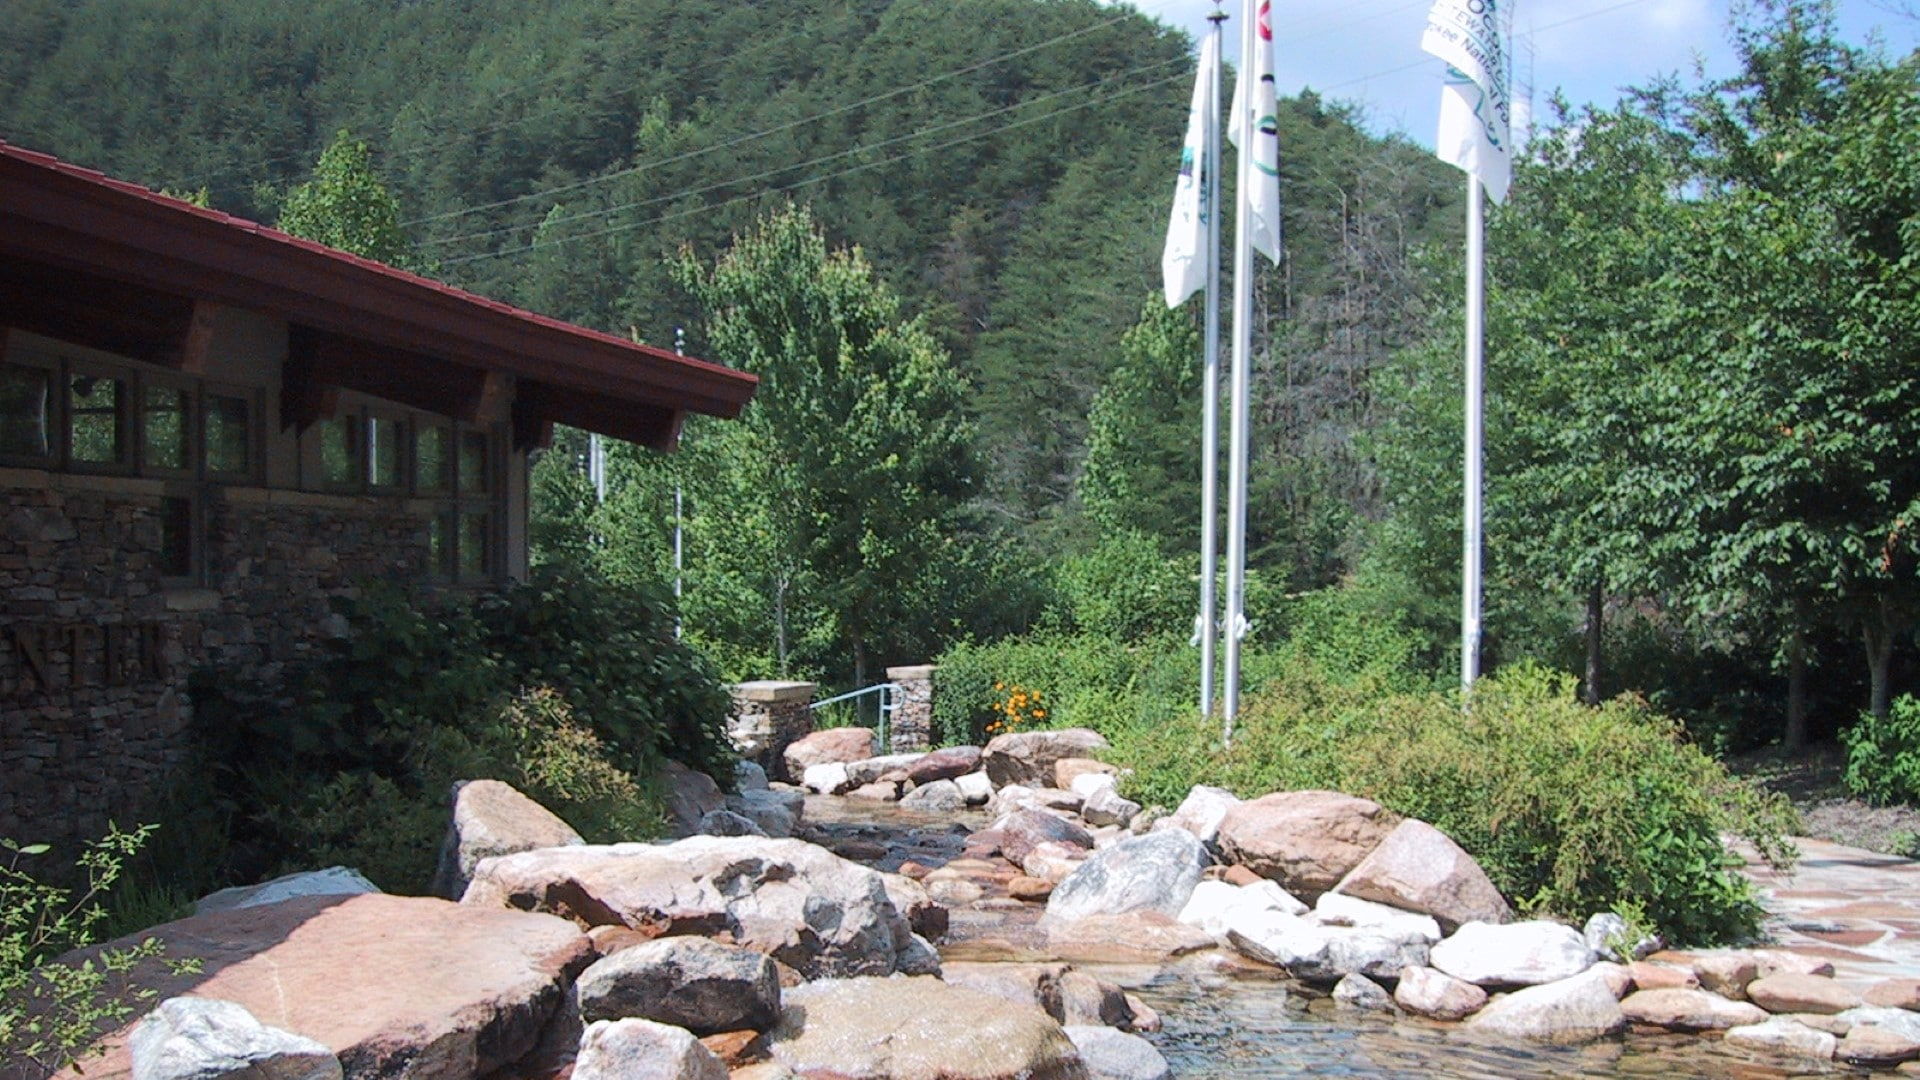 Olympic Whitewater Canoe & Kayak Venue